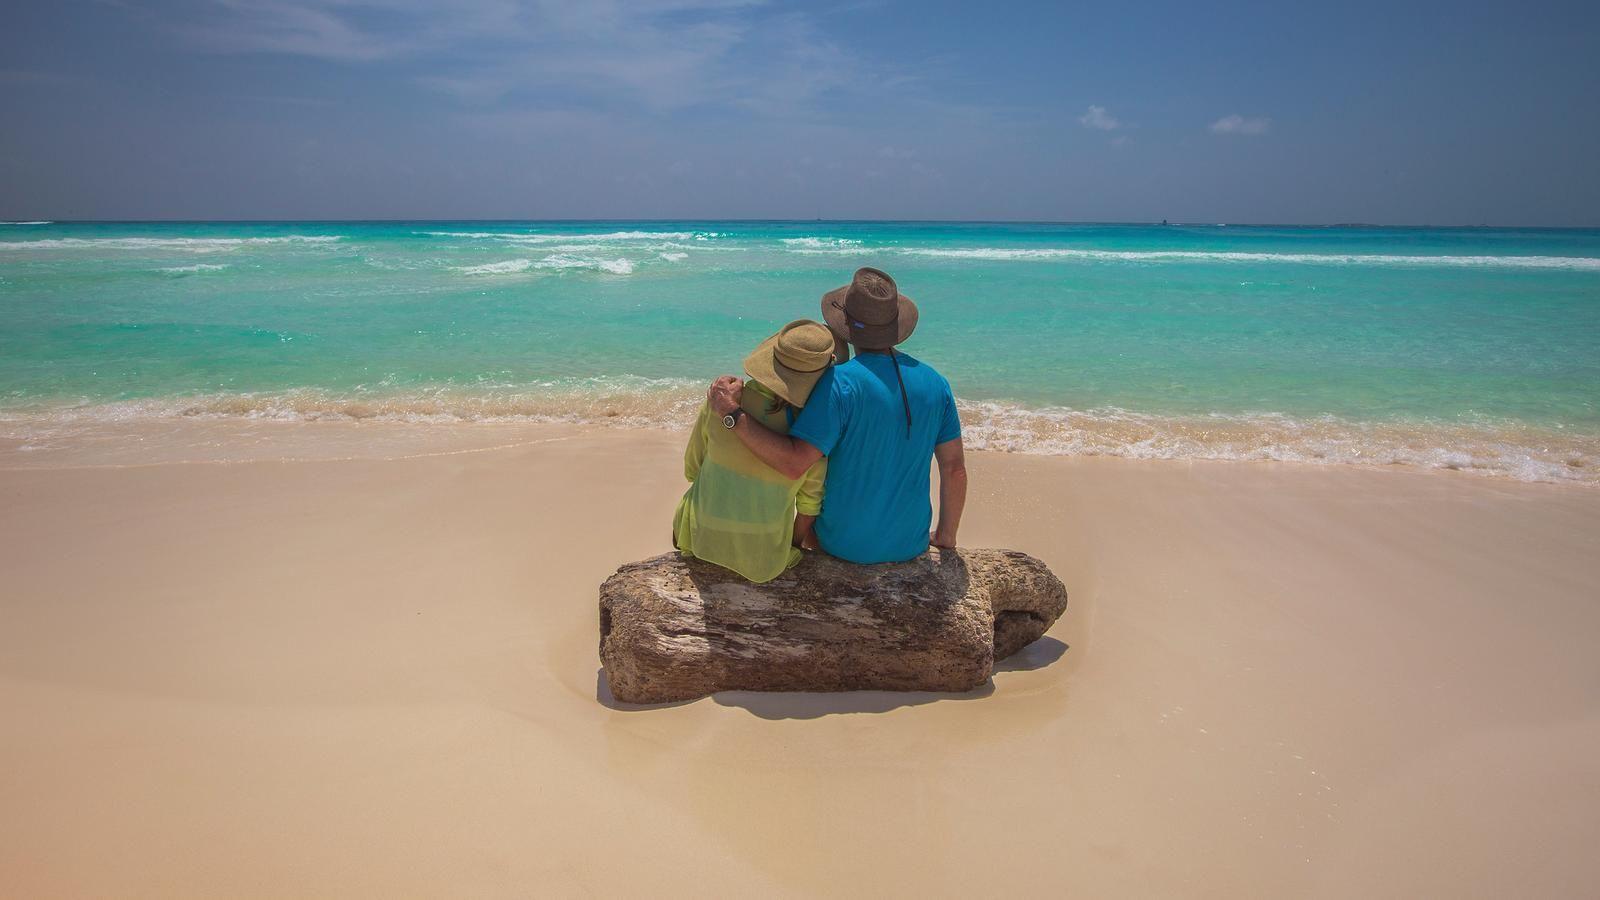 Cuba Libre & Sailing in Cuba, Central America - G Adventures #cubalibre